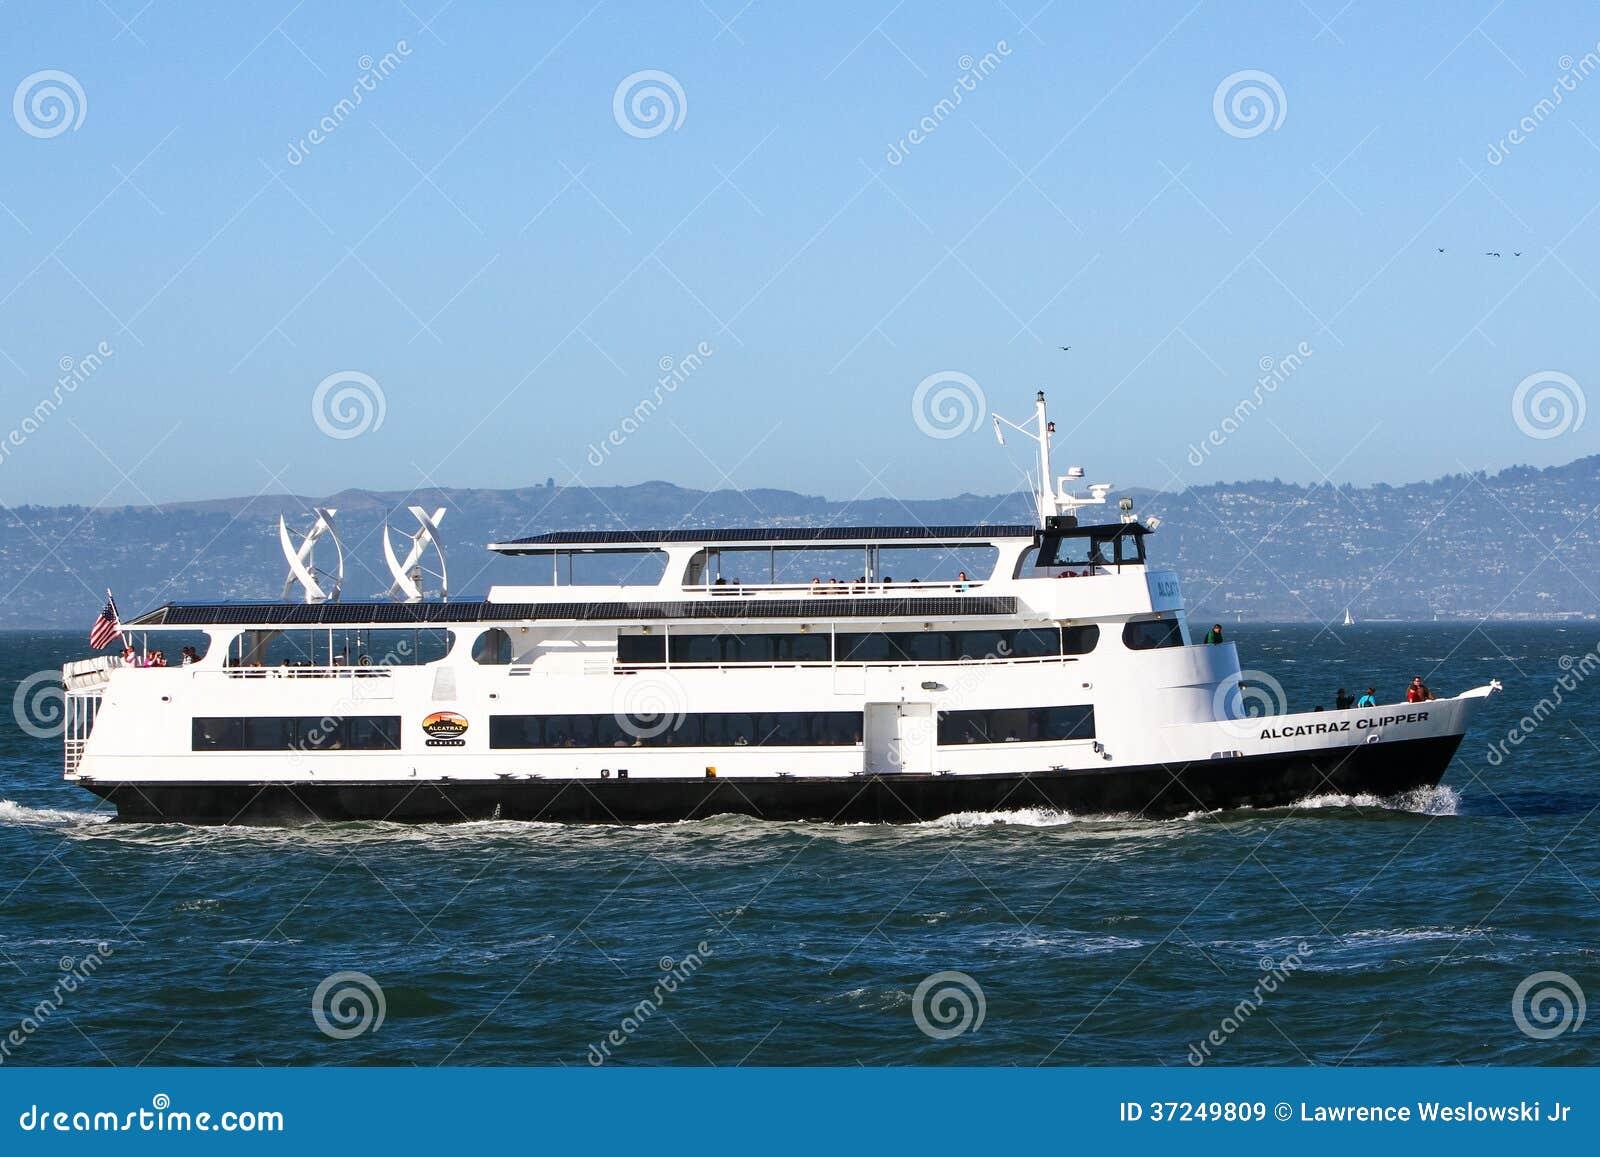 San Francisco Alcatraz Clipper Tour Boat Editorial Stock